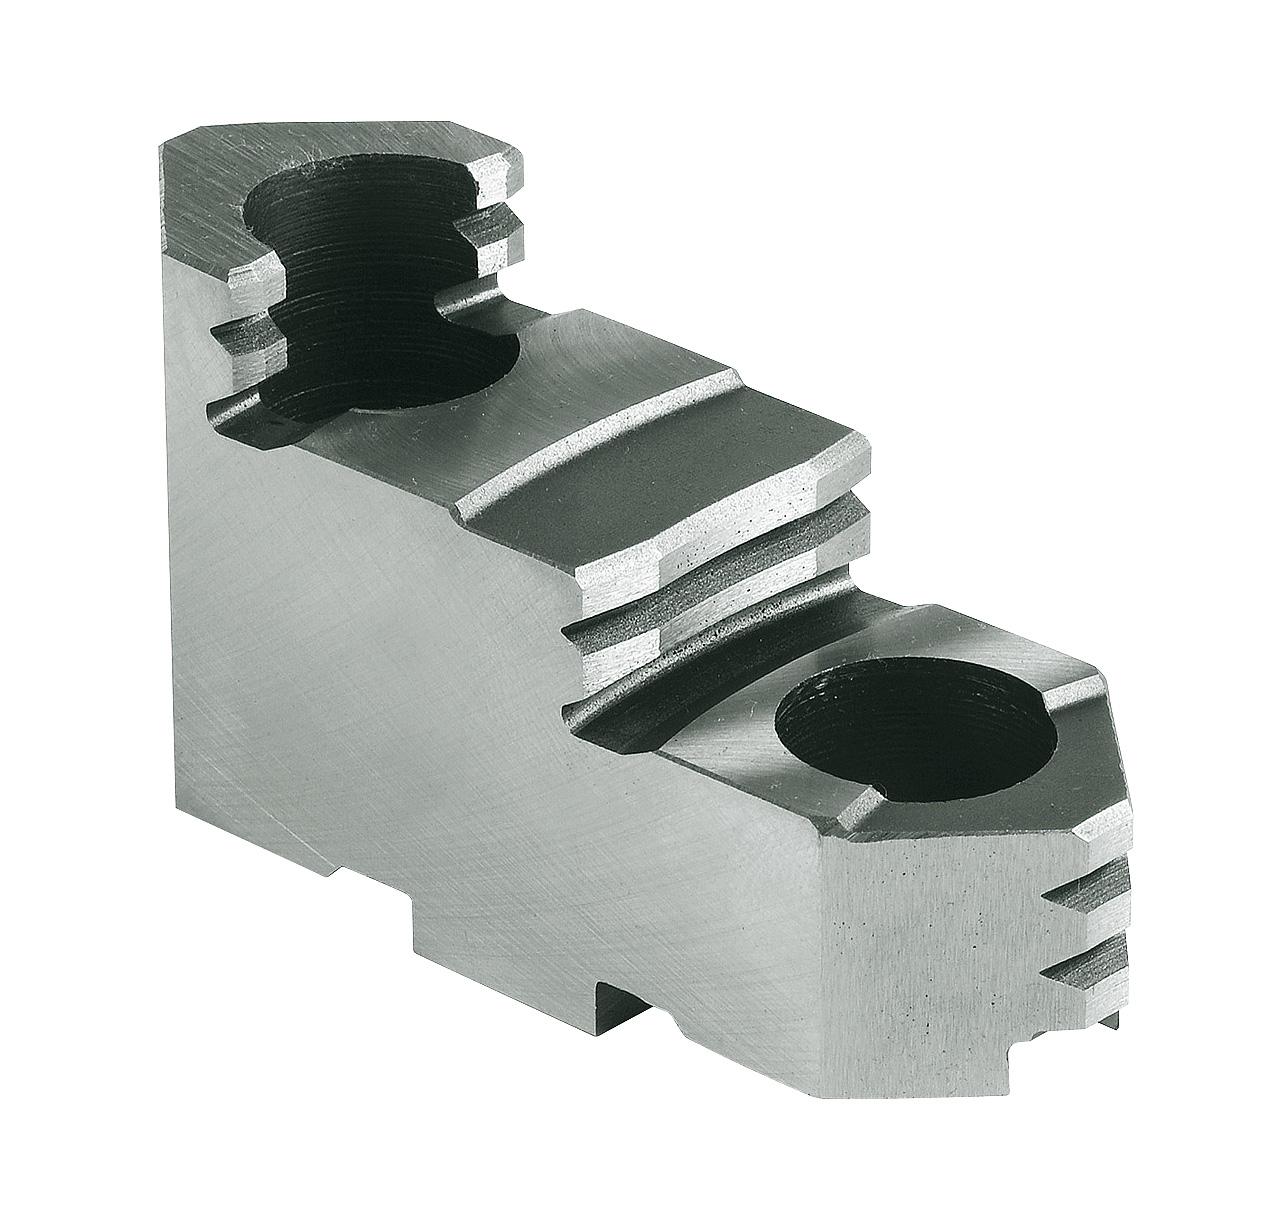 Szczęki górne twarde - komplet TJ-PS4-250 BERNARDO